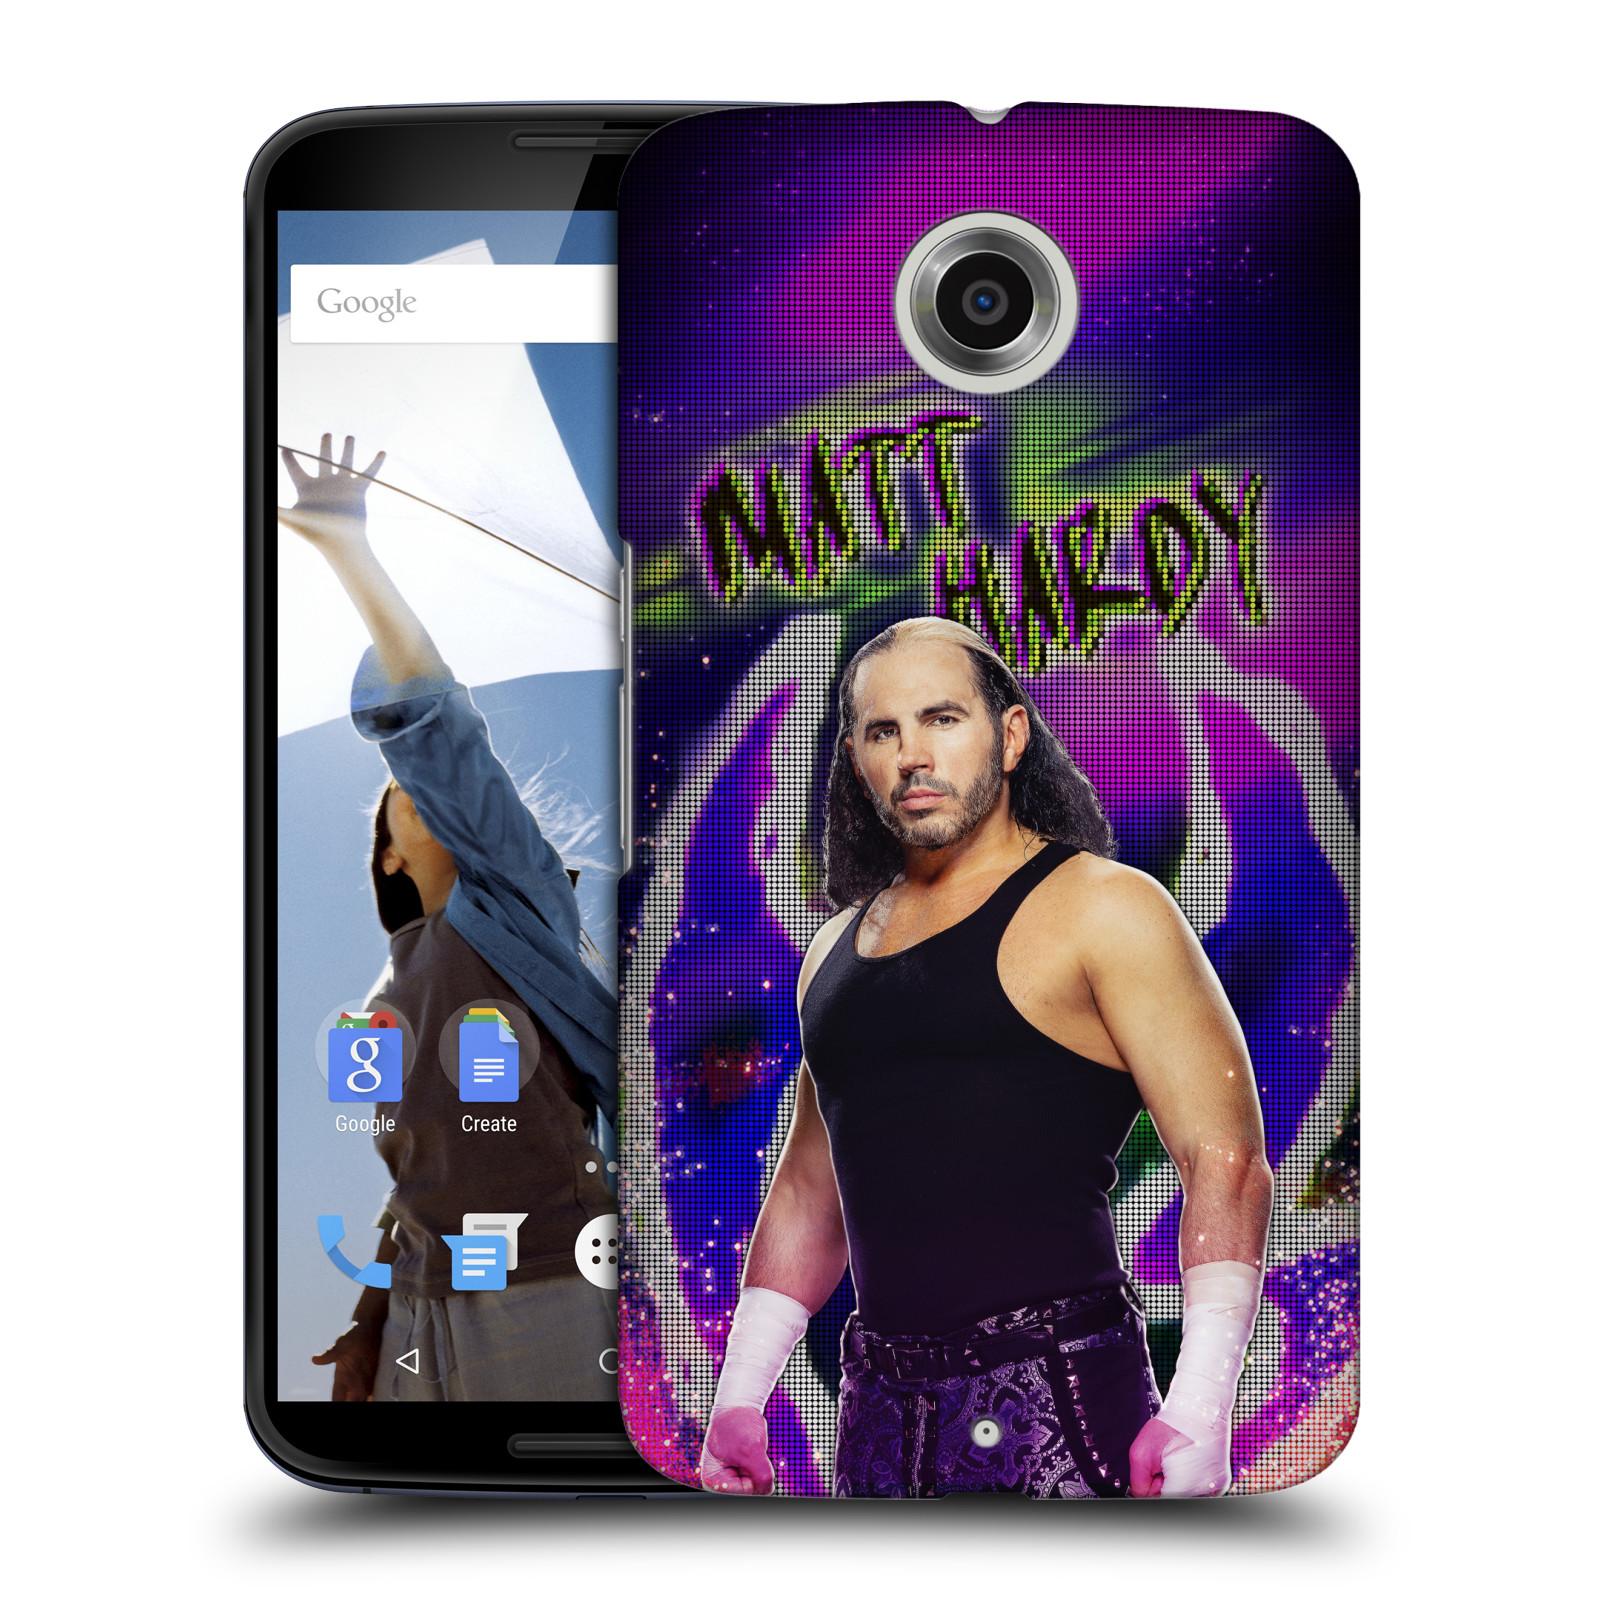 OFFICIEL-WWE-MATT-HARDY-ETUI-COQUE-D-039-ARRIERE-RIGIDE-POUR-MOTOROLA-TELEPHONES-2